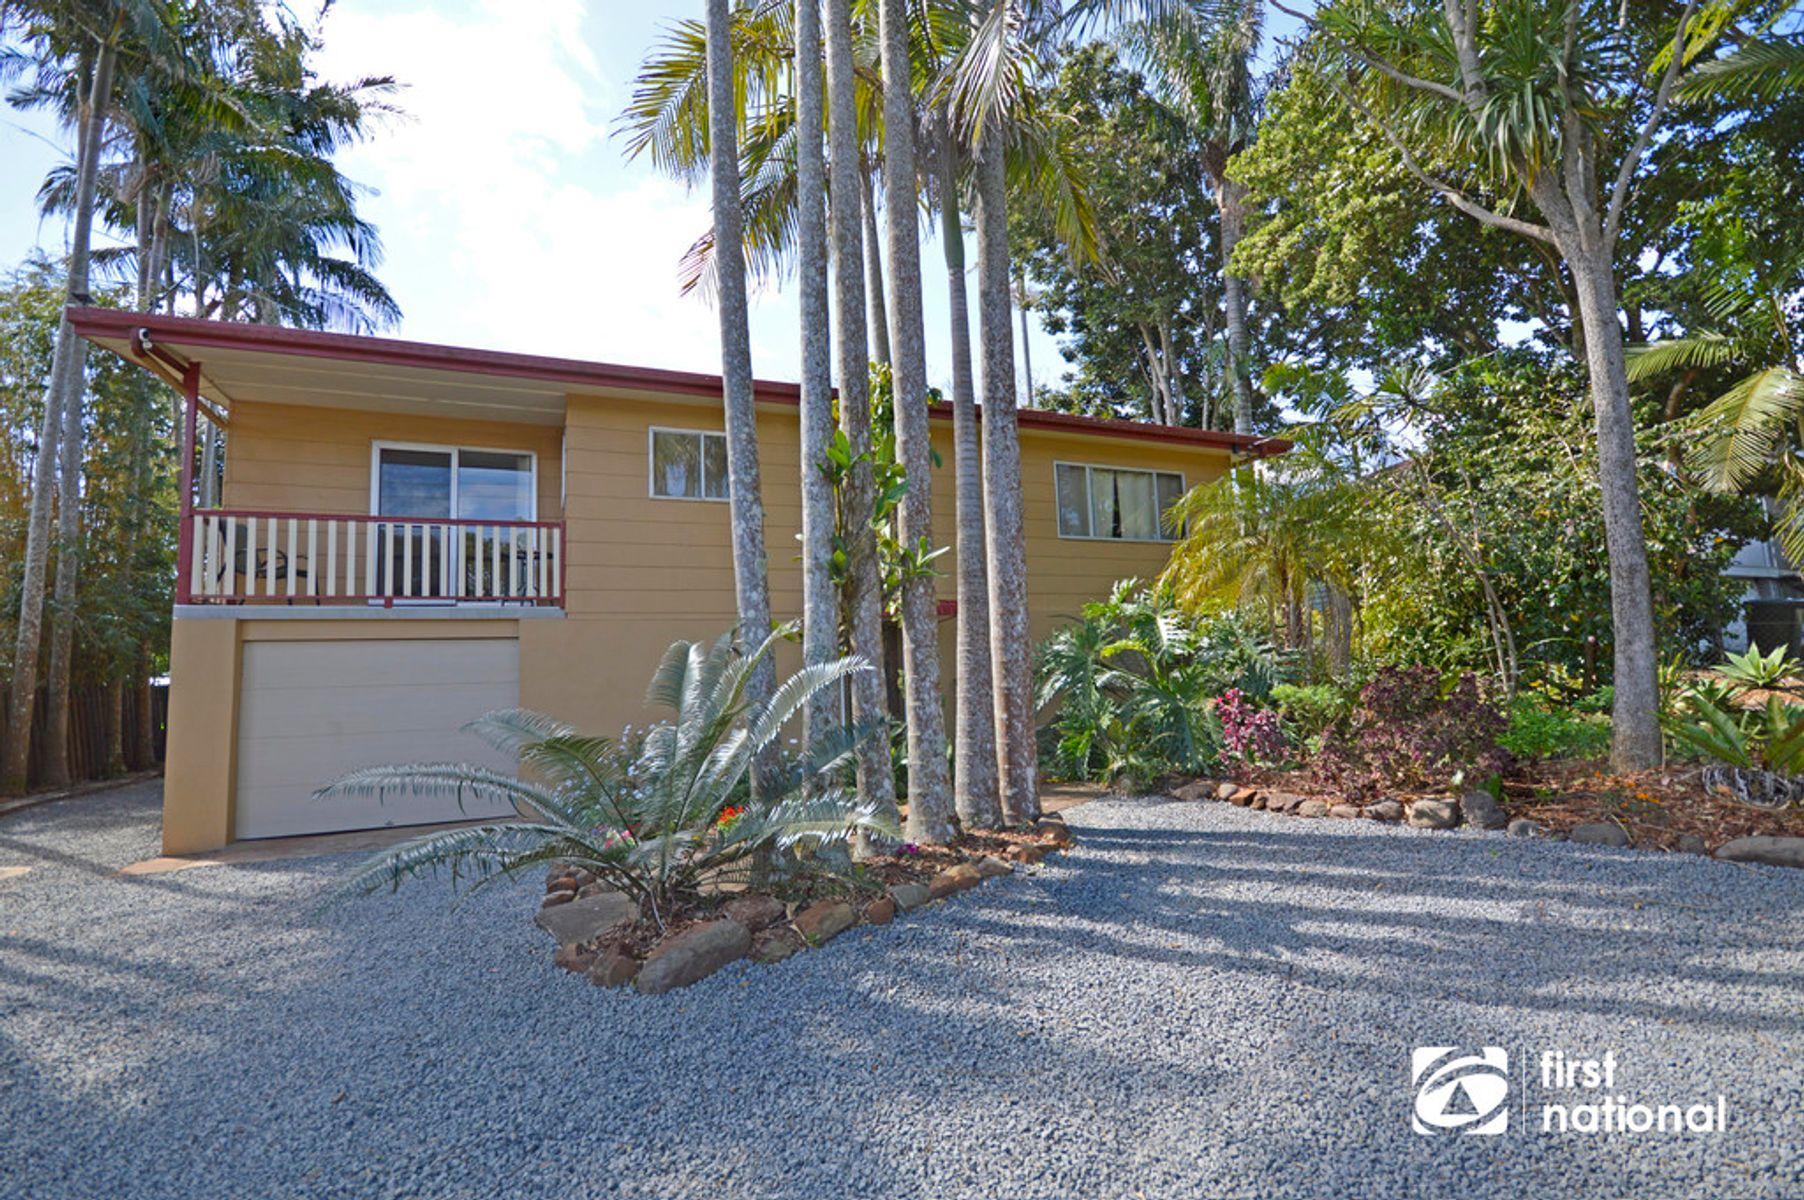 17 Beacon Road, Tamborine Mountain, QLD 4272